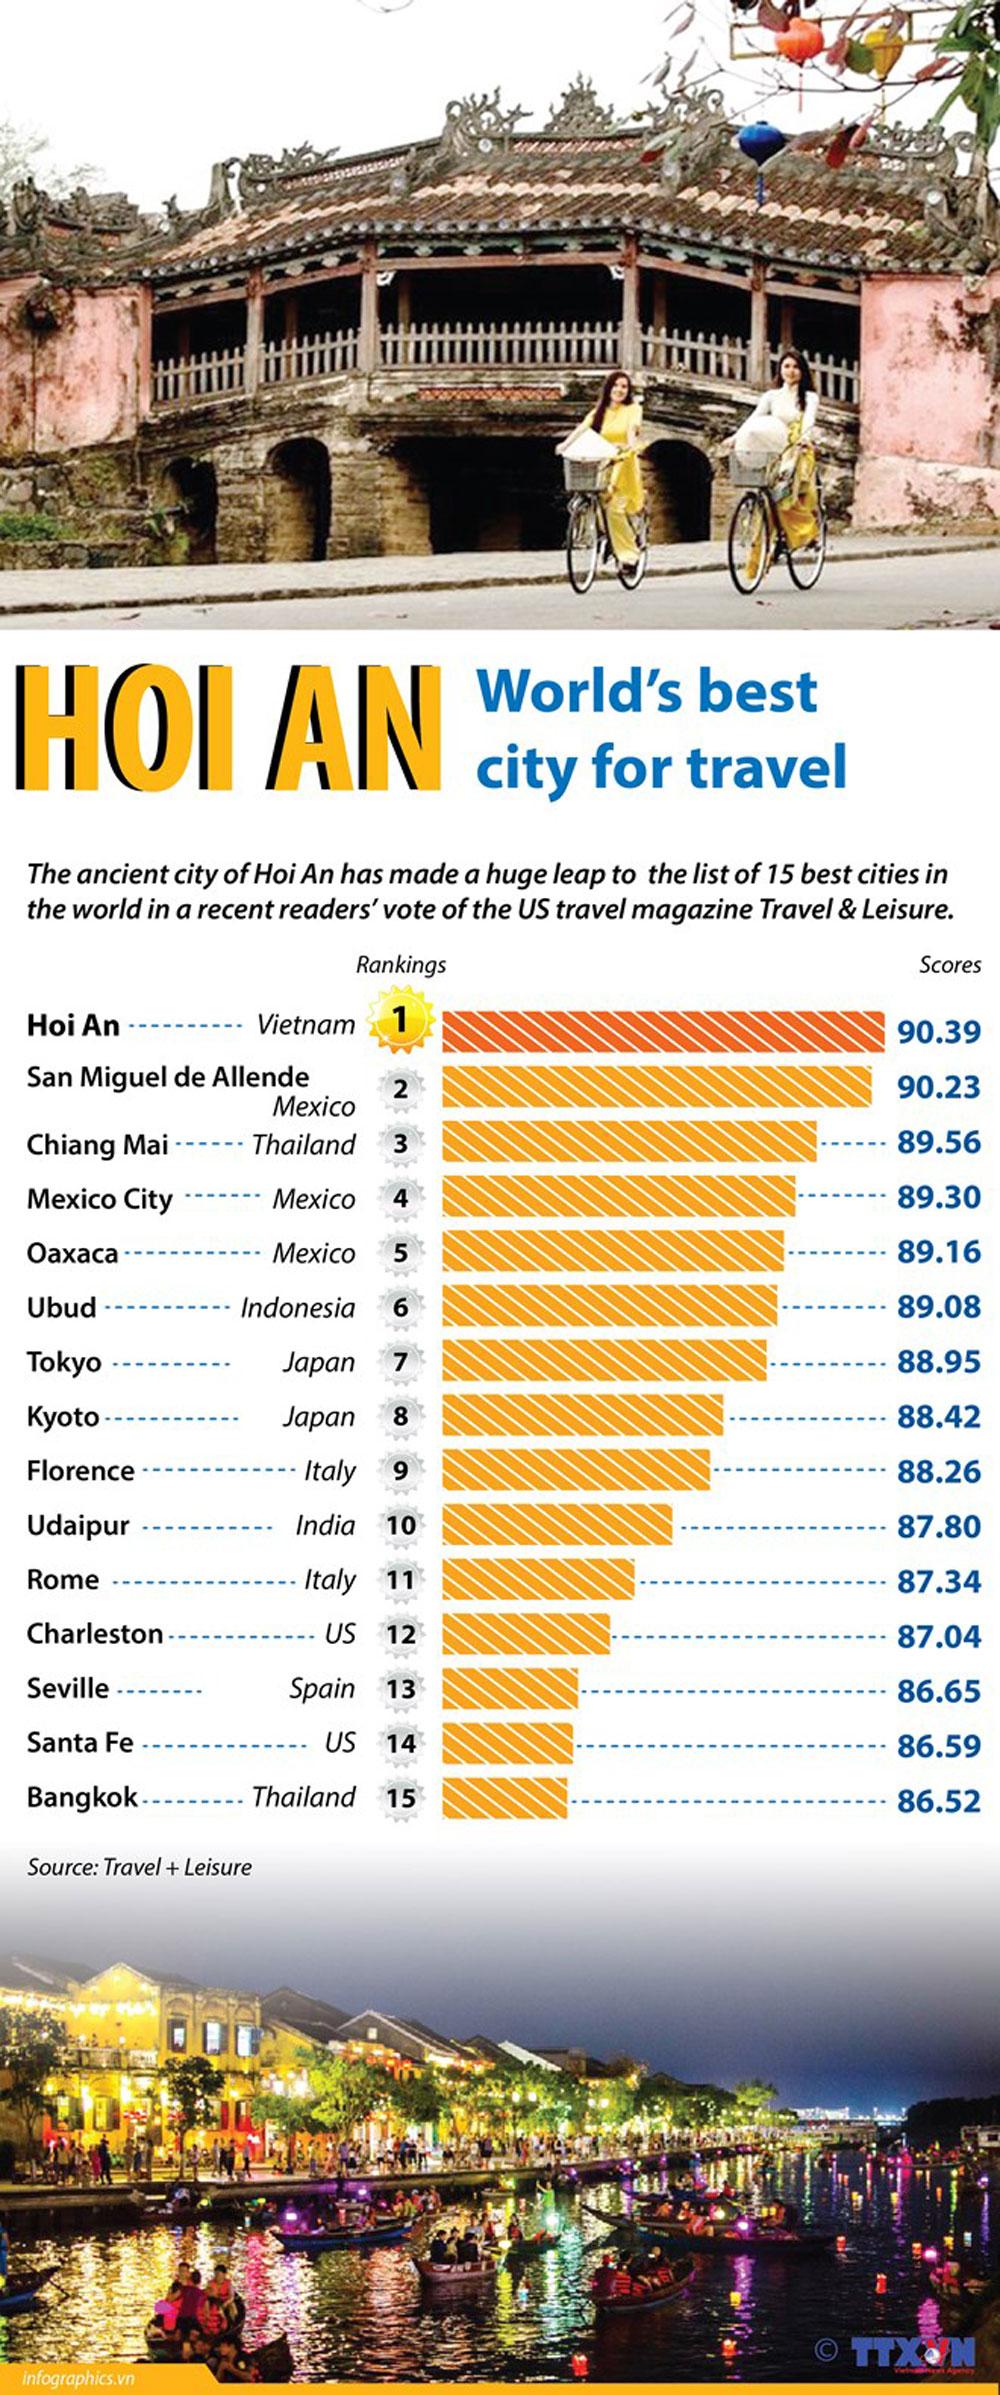 Hoi An, world's best city, travel destination, popular destination, tourist attraction